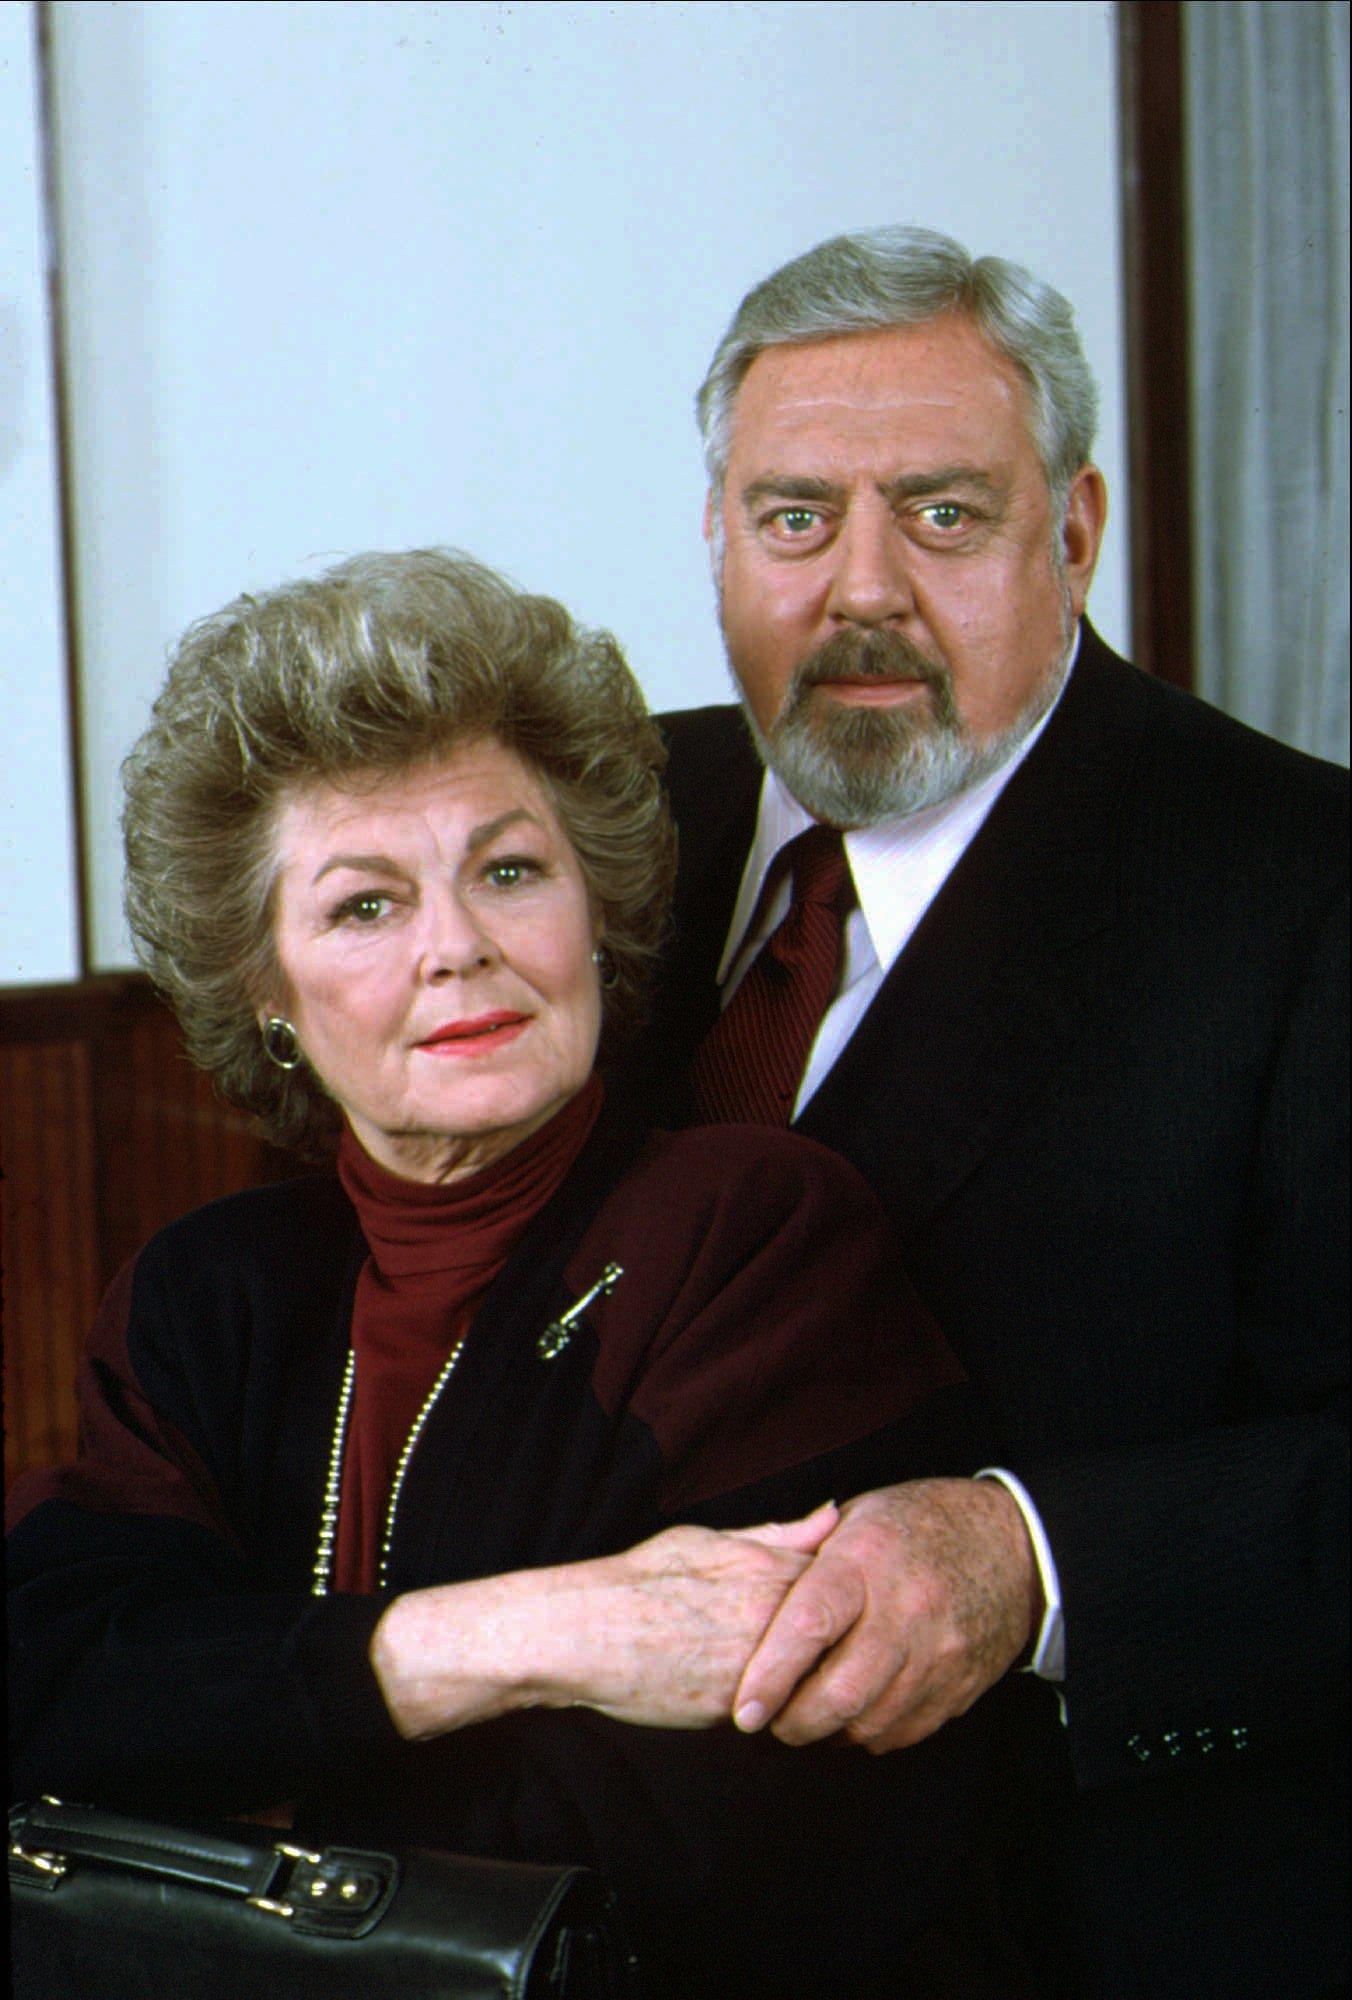 Barbara Hale Who Played Della Street On Perry Mason S At 94 The Washington Post